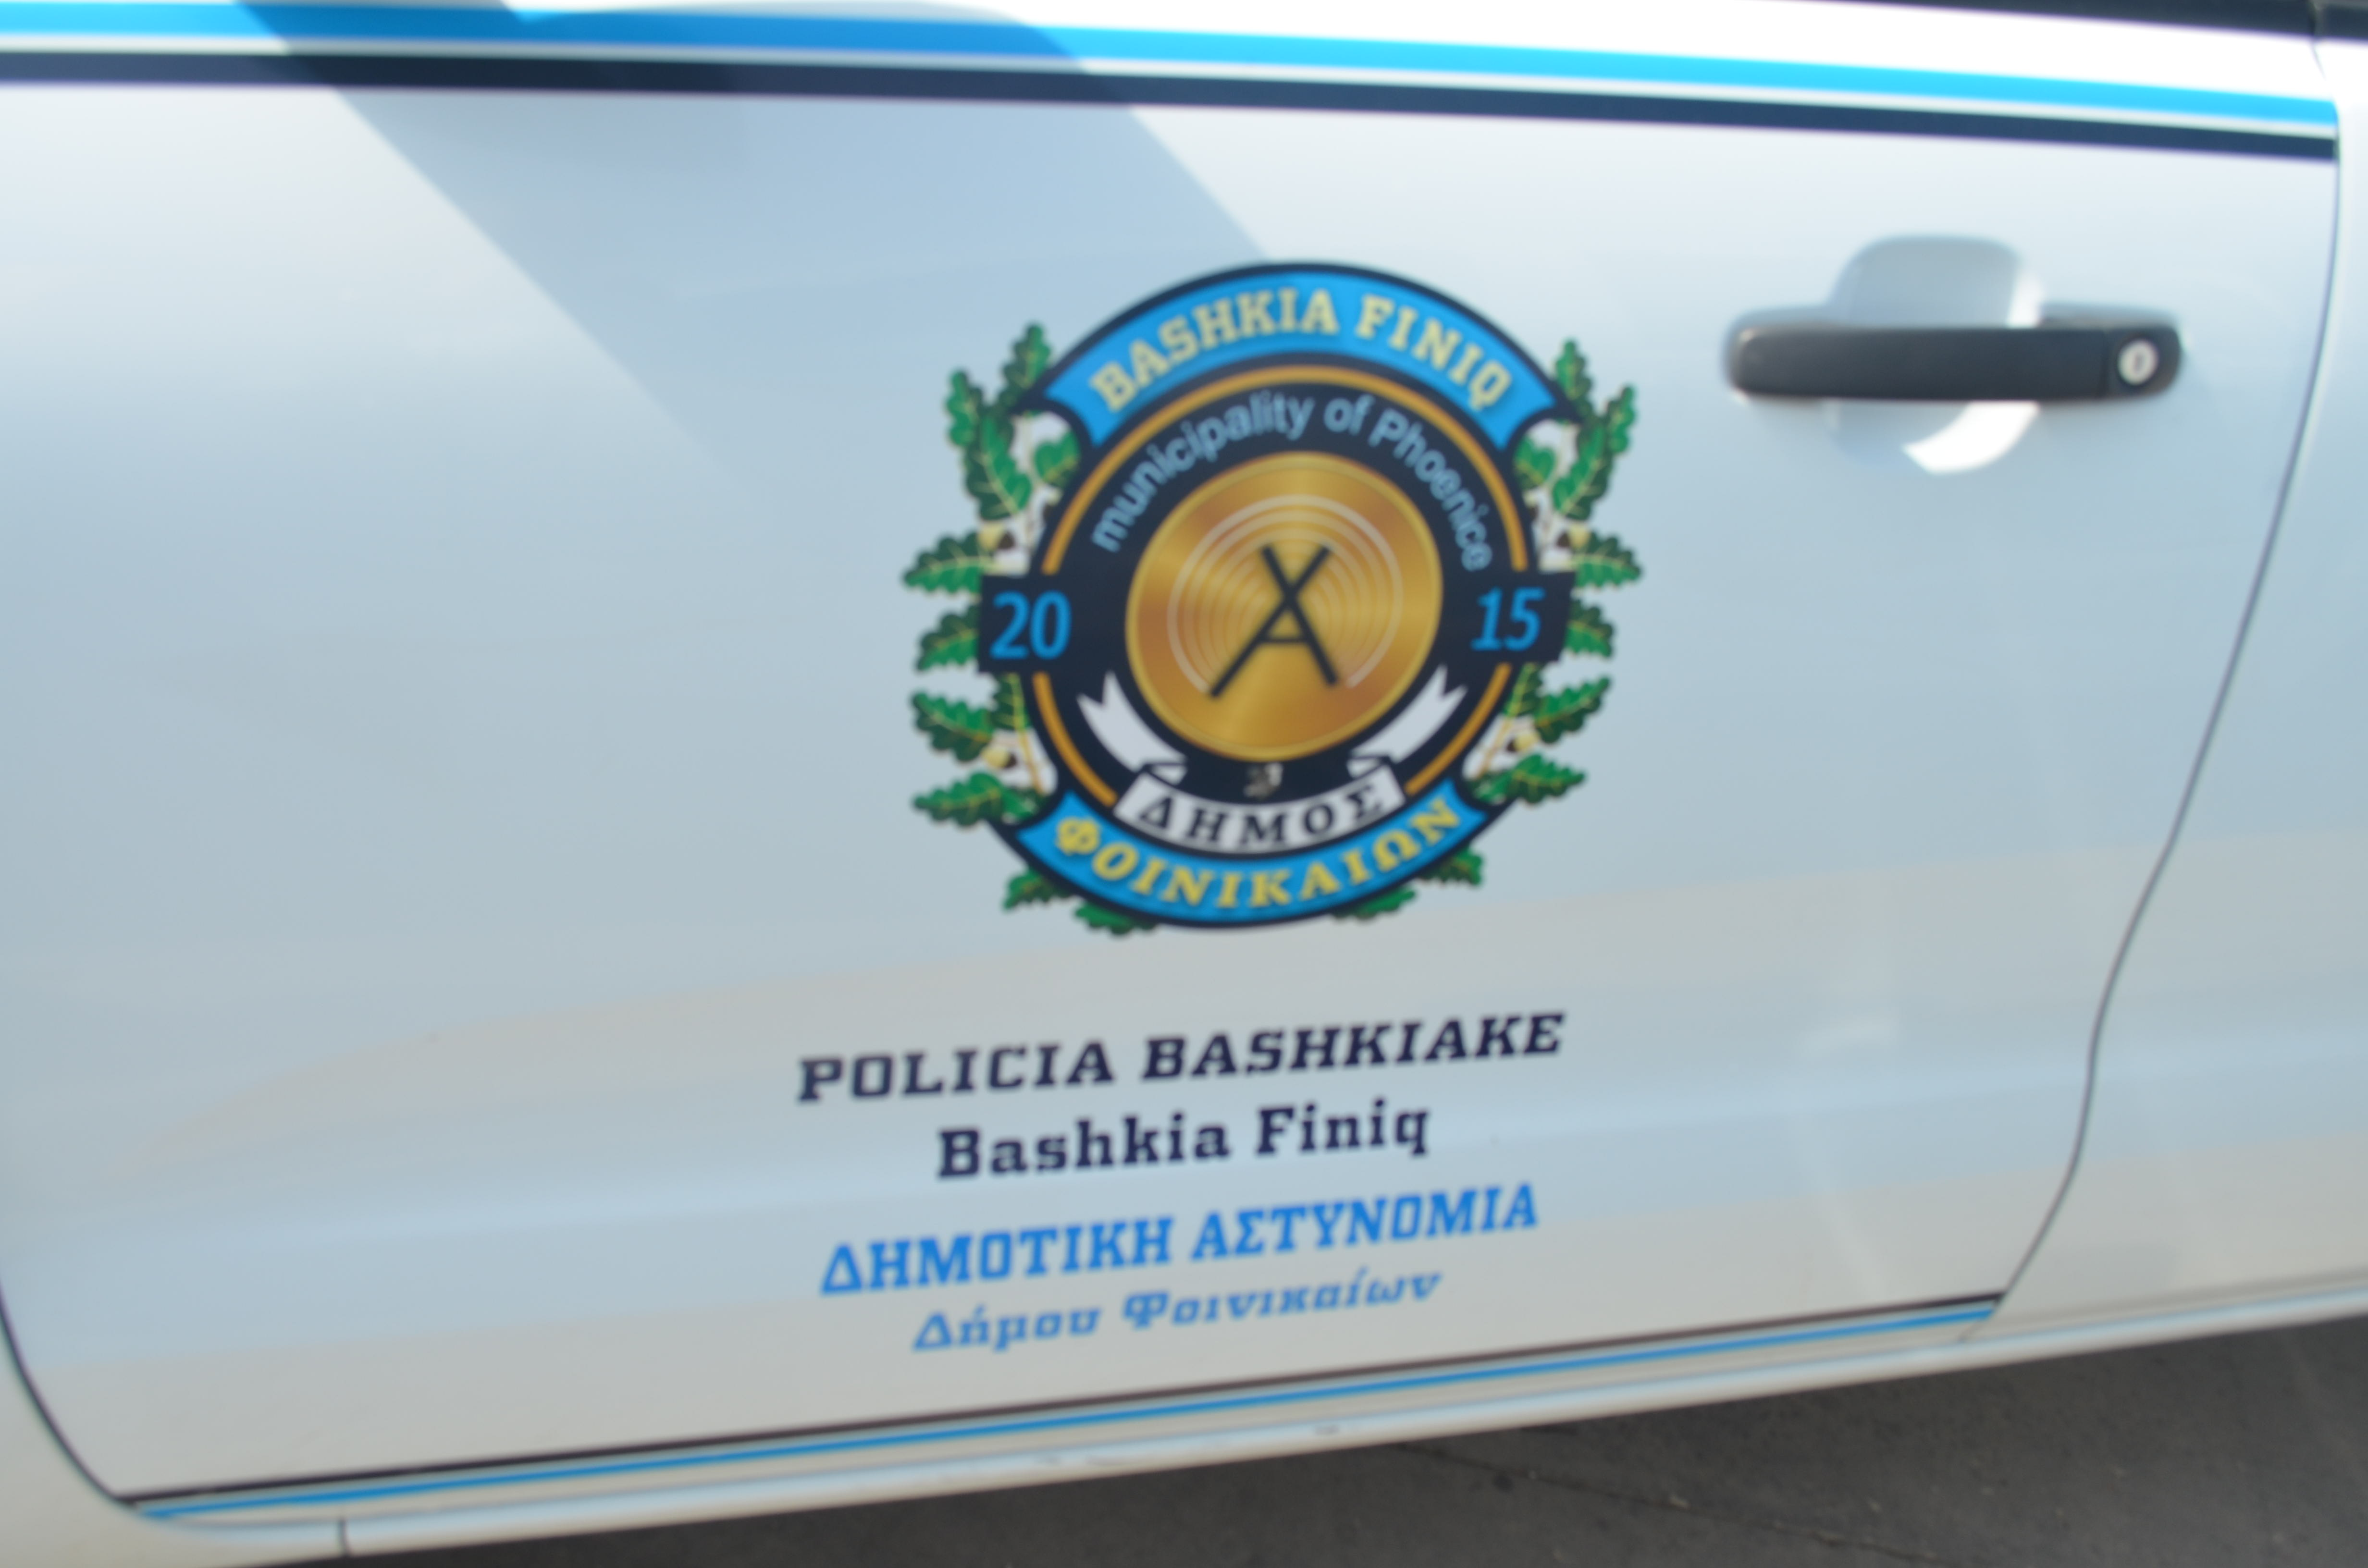 policia-bashkiake